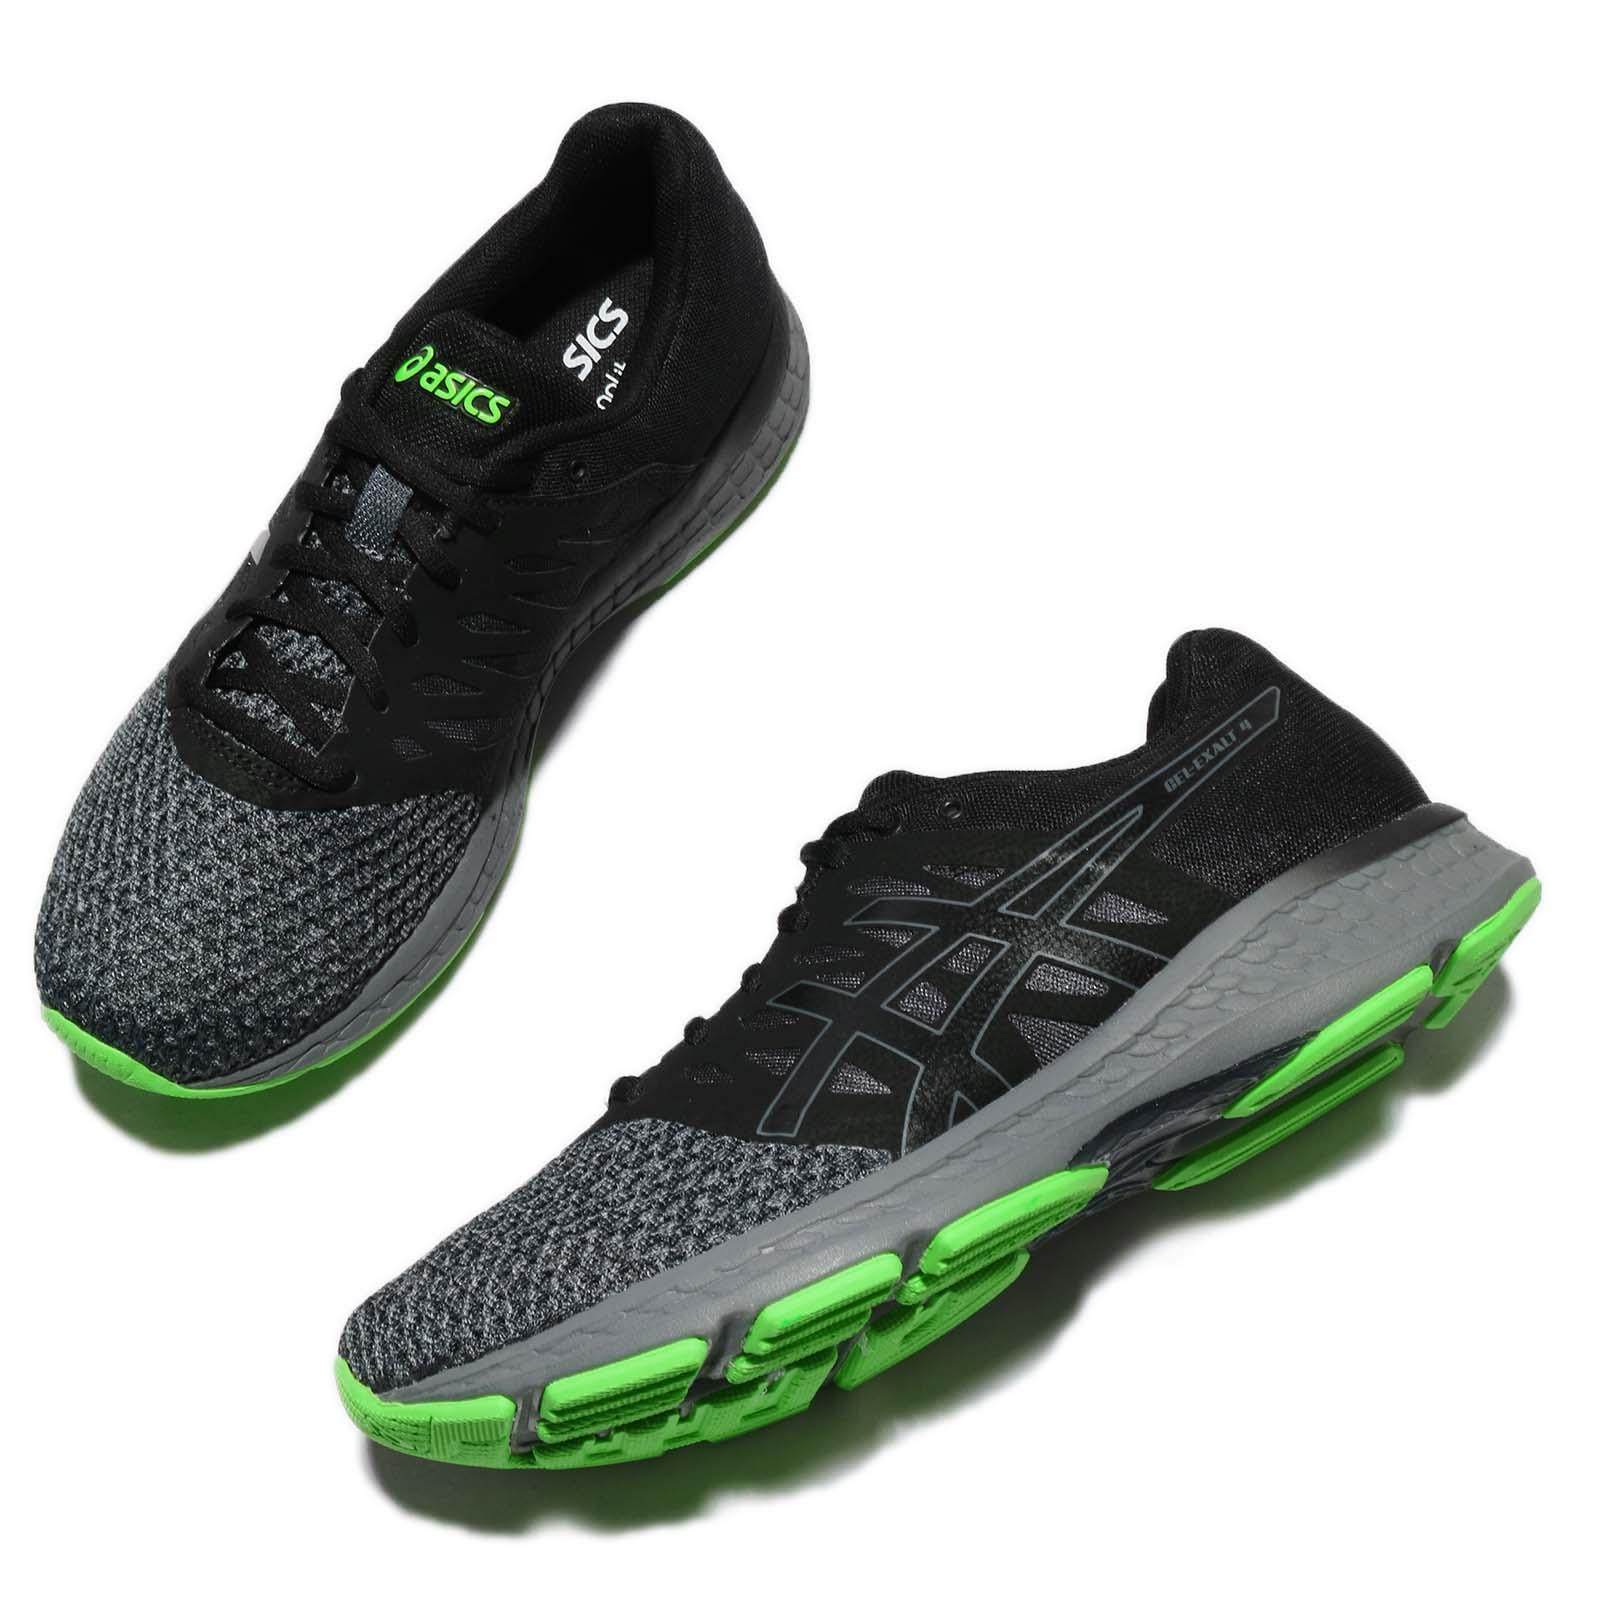 Asics Gel-Exalt 4 IV Black Carbon Green Men Running Shoes Trainers ... 0f9512df44